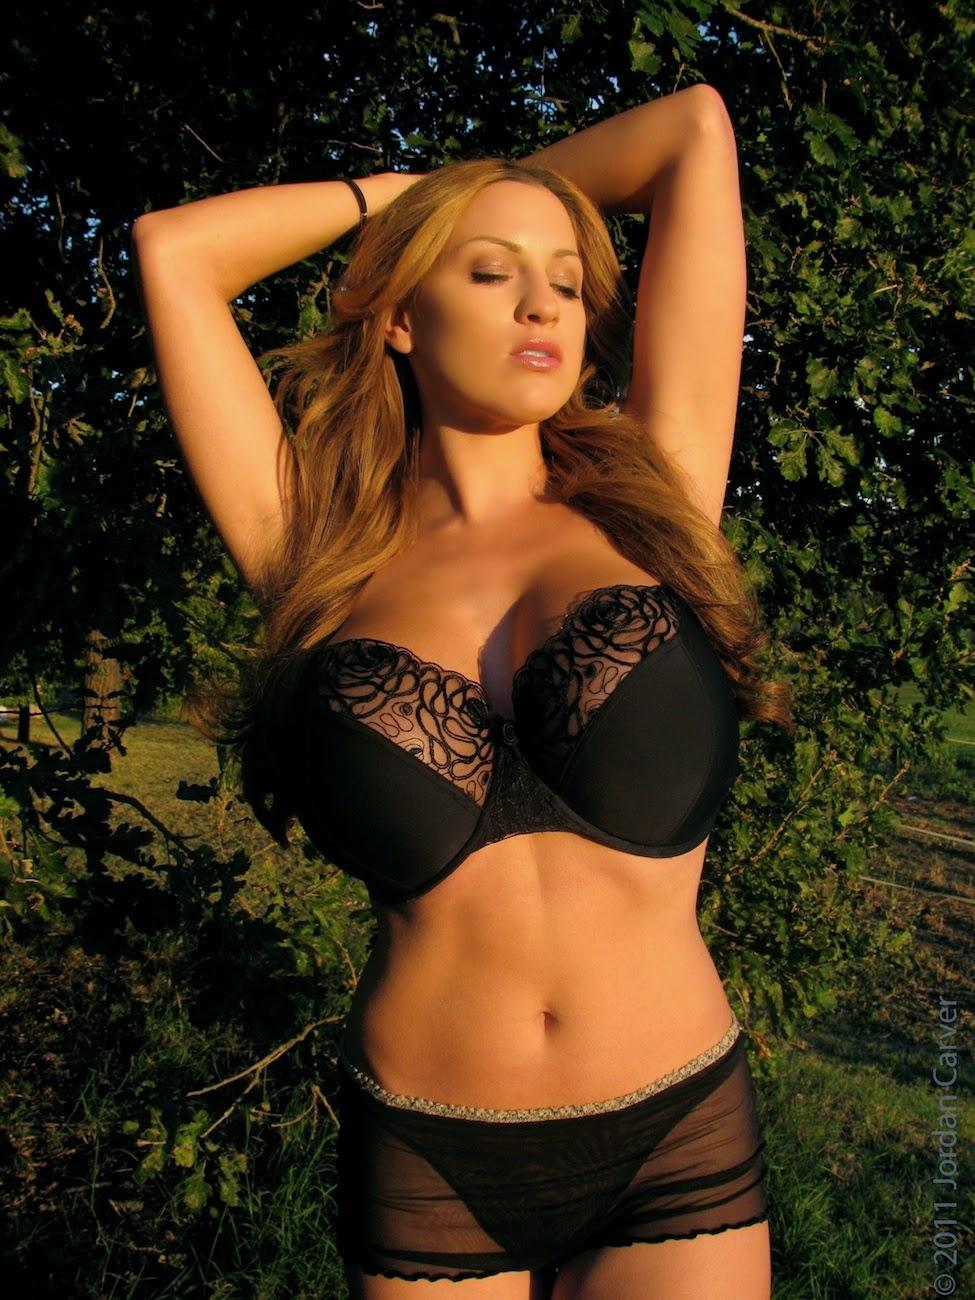 Jordan Carver Big Boobs In Black See Through Bra And Panty -2569